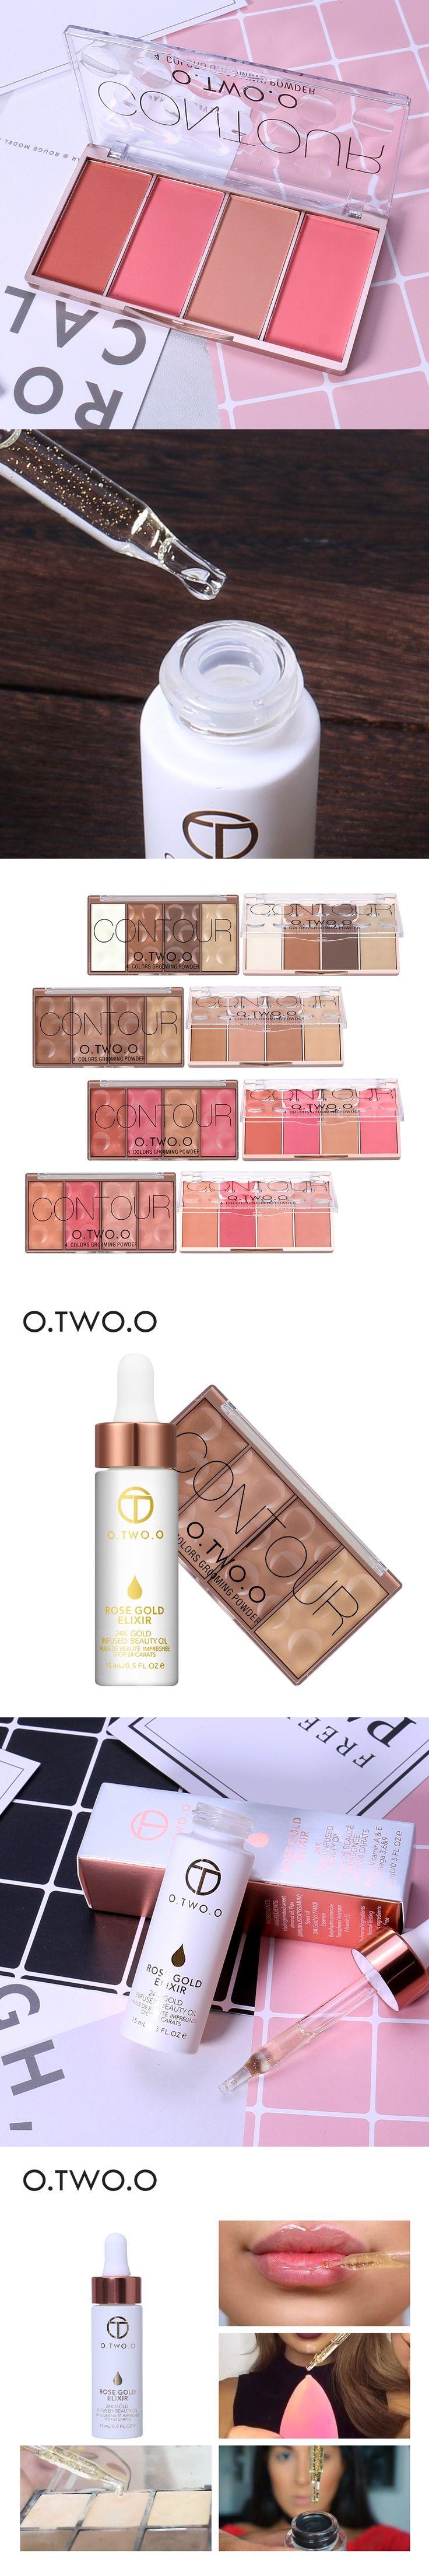 O.TWO.O 2pcs/set Face Make up 24k Rose Gold Elixir Skin Make Up Essential Oil +Contour Bronzer Blush Shading Face Powder Contour